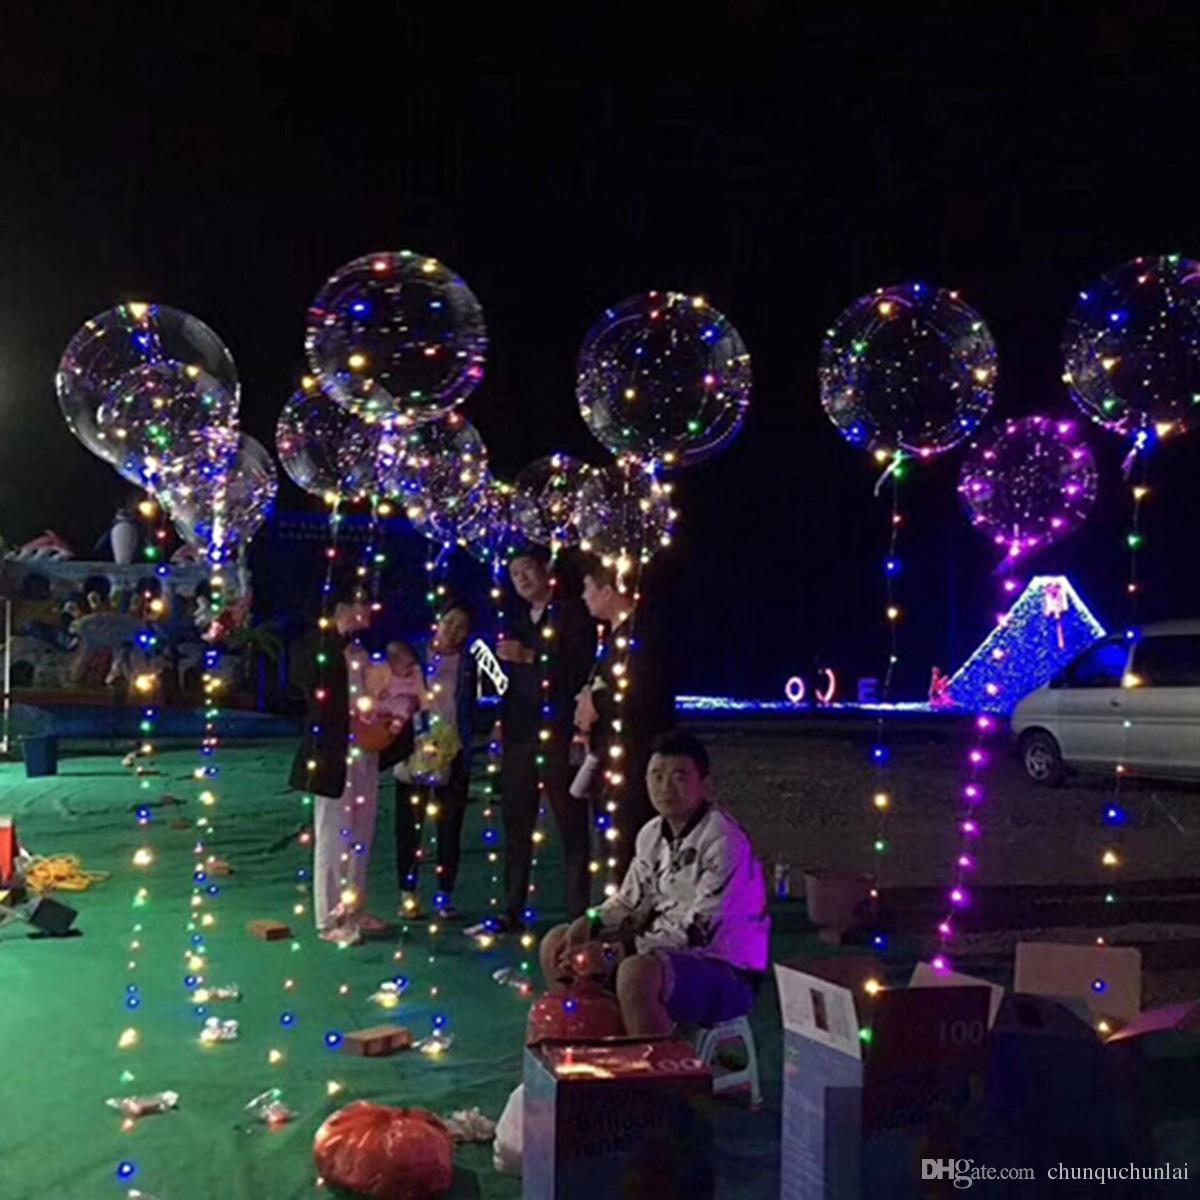 new light up toys led string lights flasher lighting balloon wave ball 18inch helium balloons christmas halloween decoration toys led lighting balloon